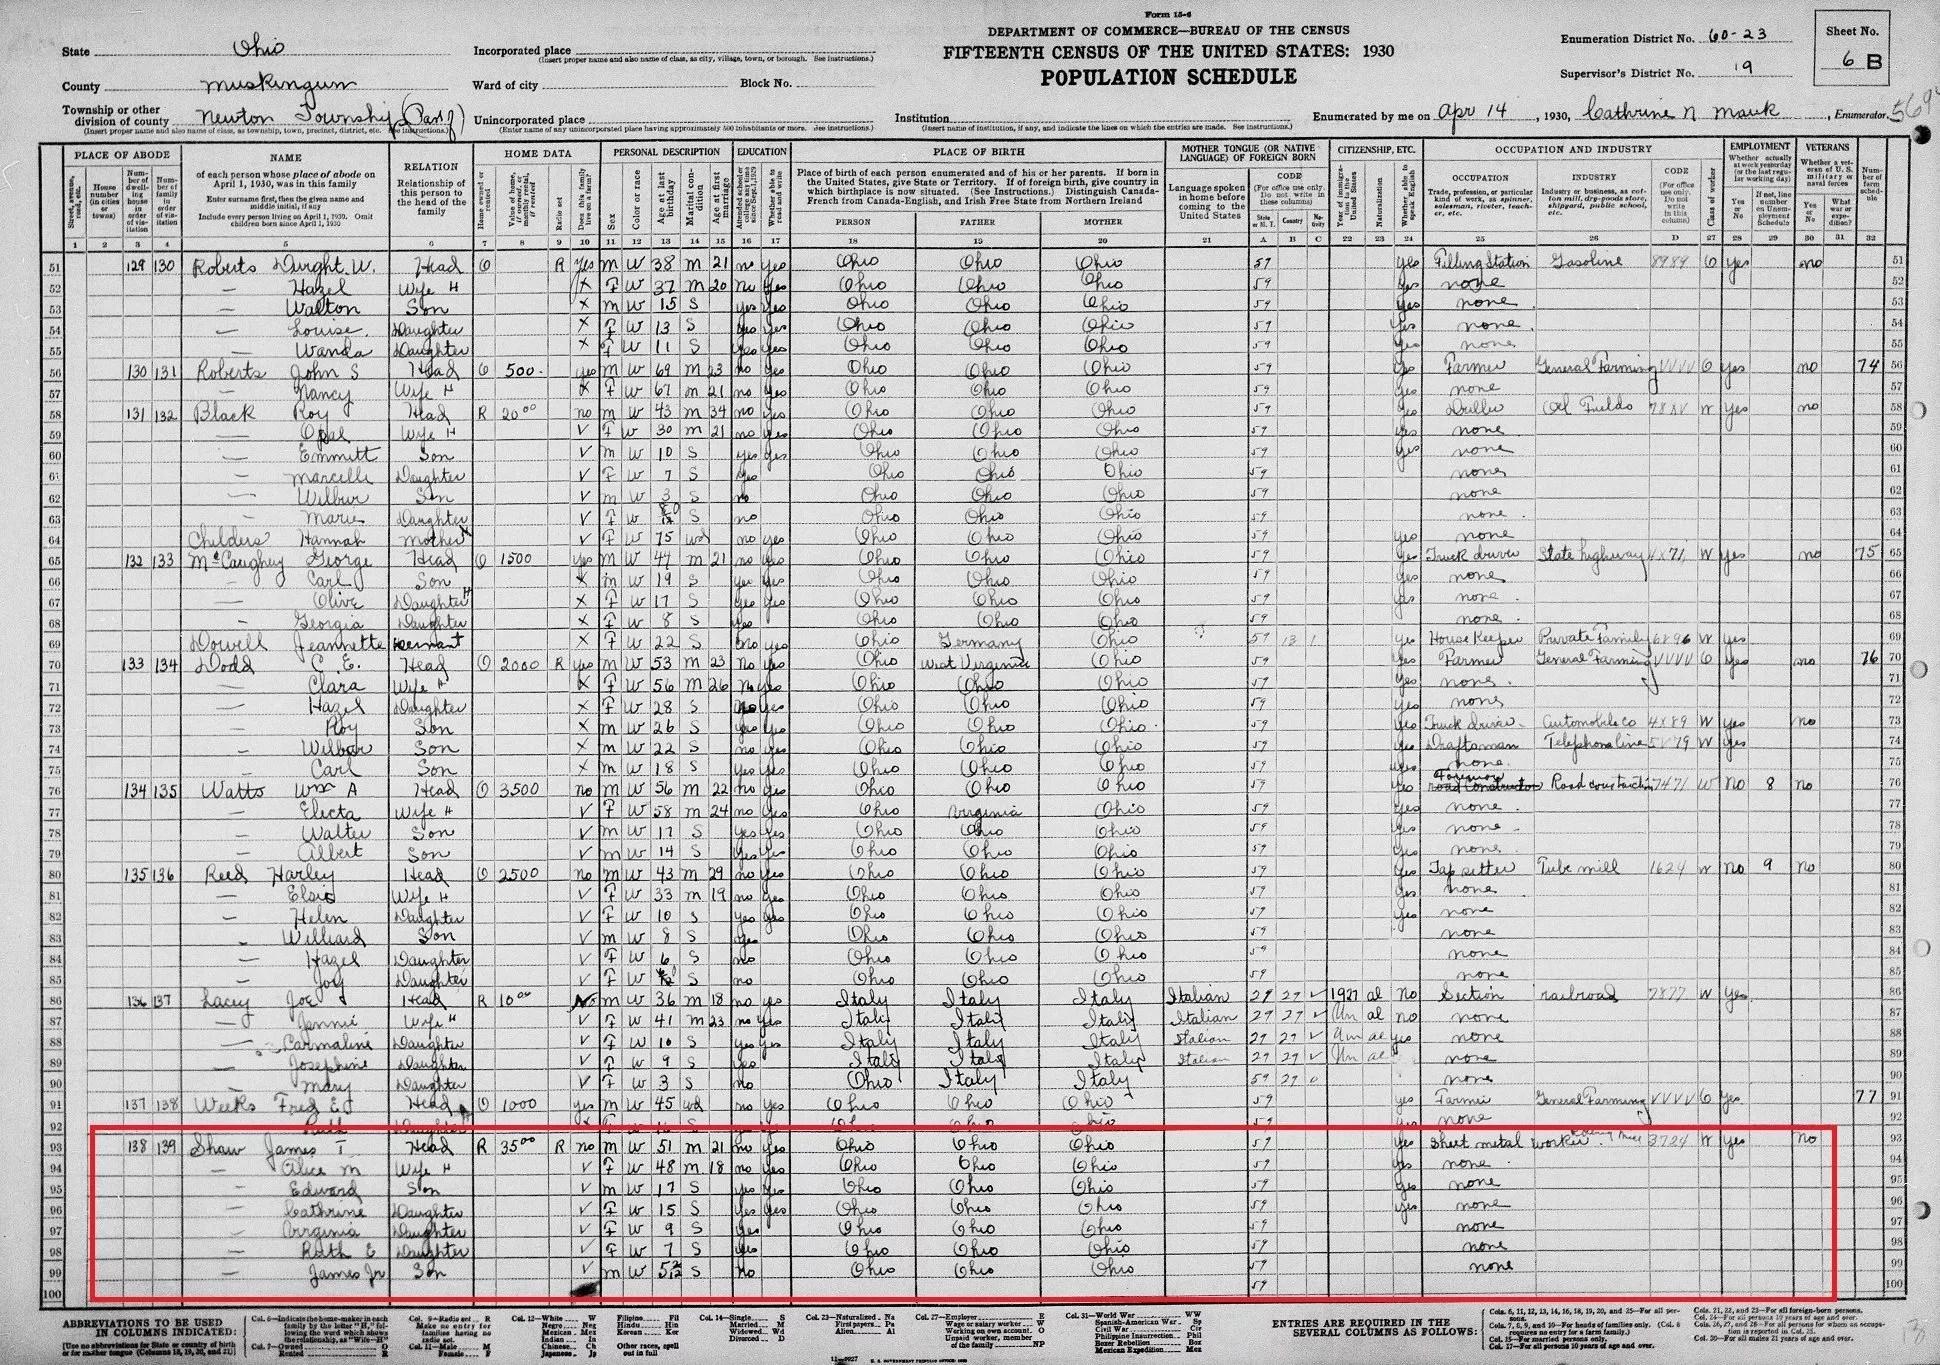 [Credit: MyHeritage 1930 U.S. Census Records]